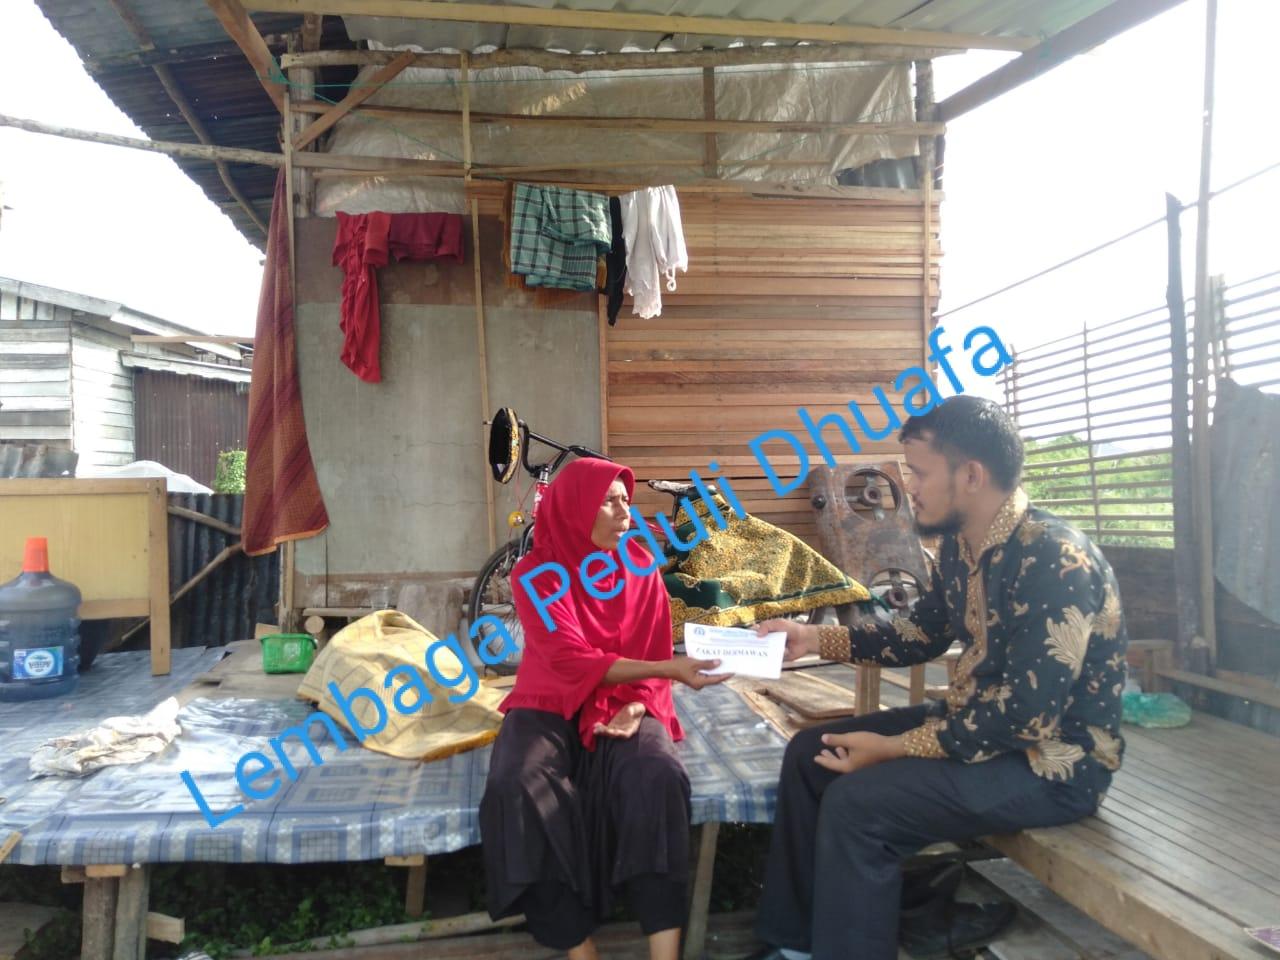 Lembaga Peduli Dhuafa Bantu Modal Usaha Dhuafa, Ibu yang memiliki  tanggungan 4 anak Yatim, Kota Lhokseumawe